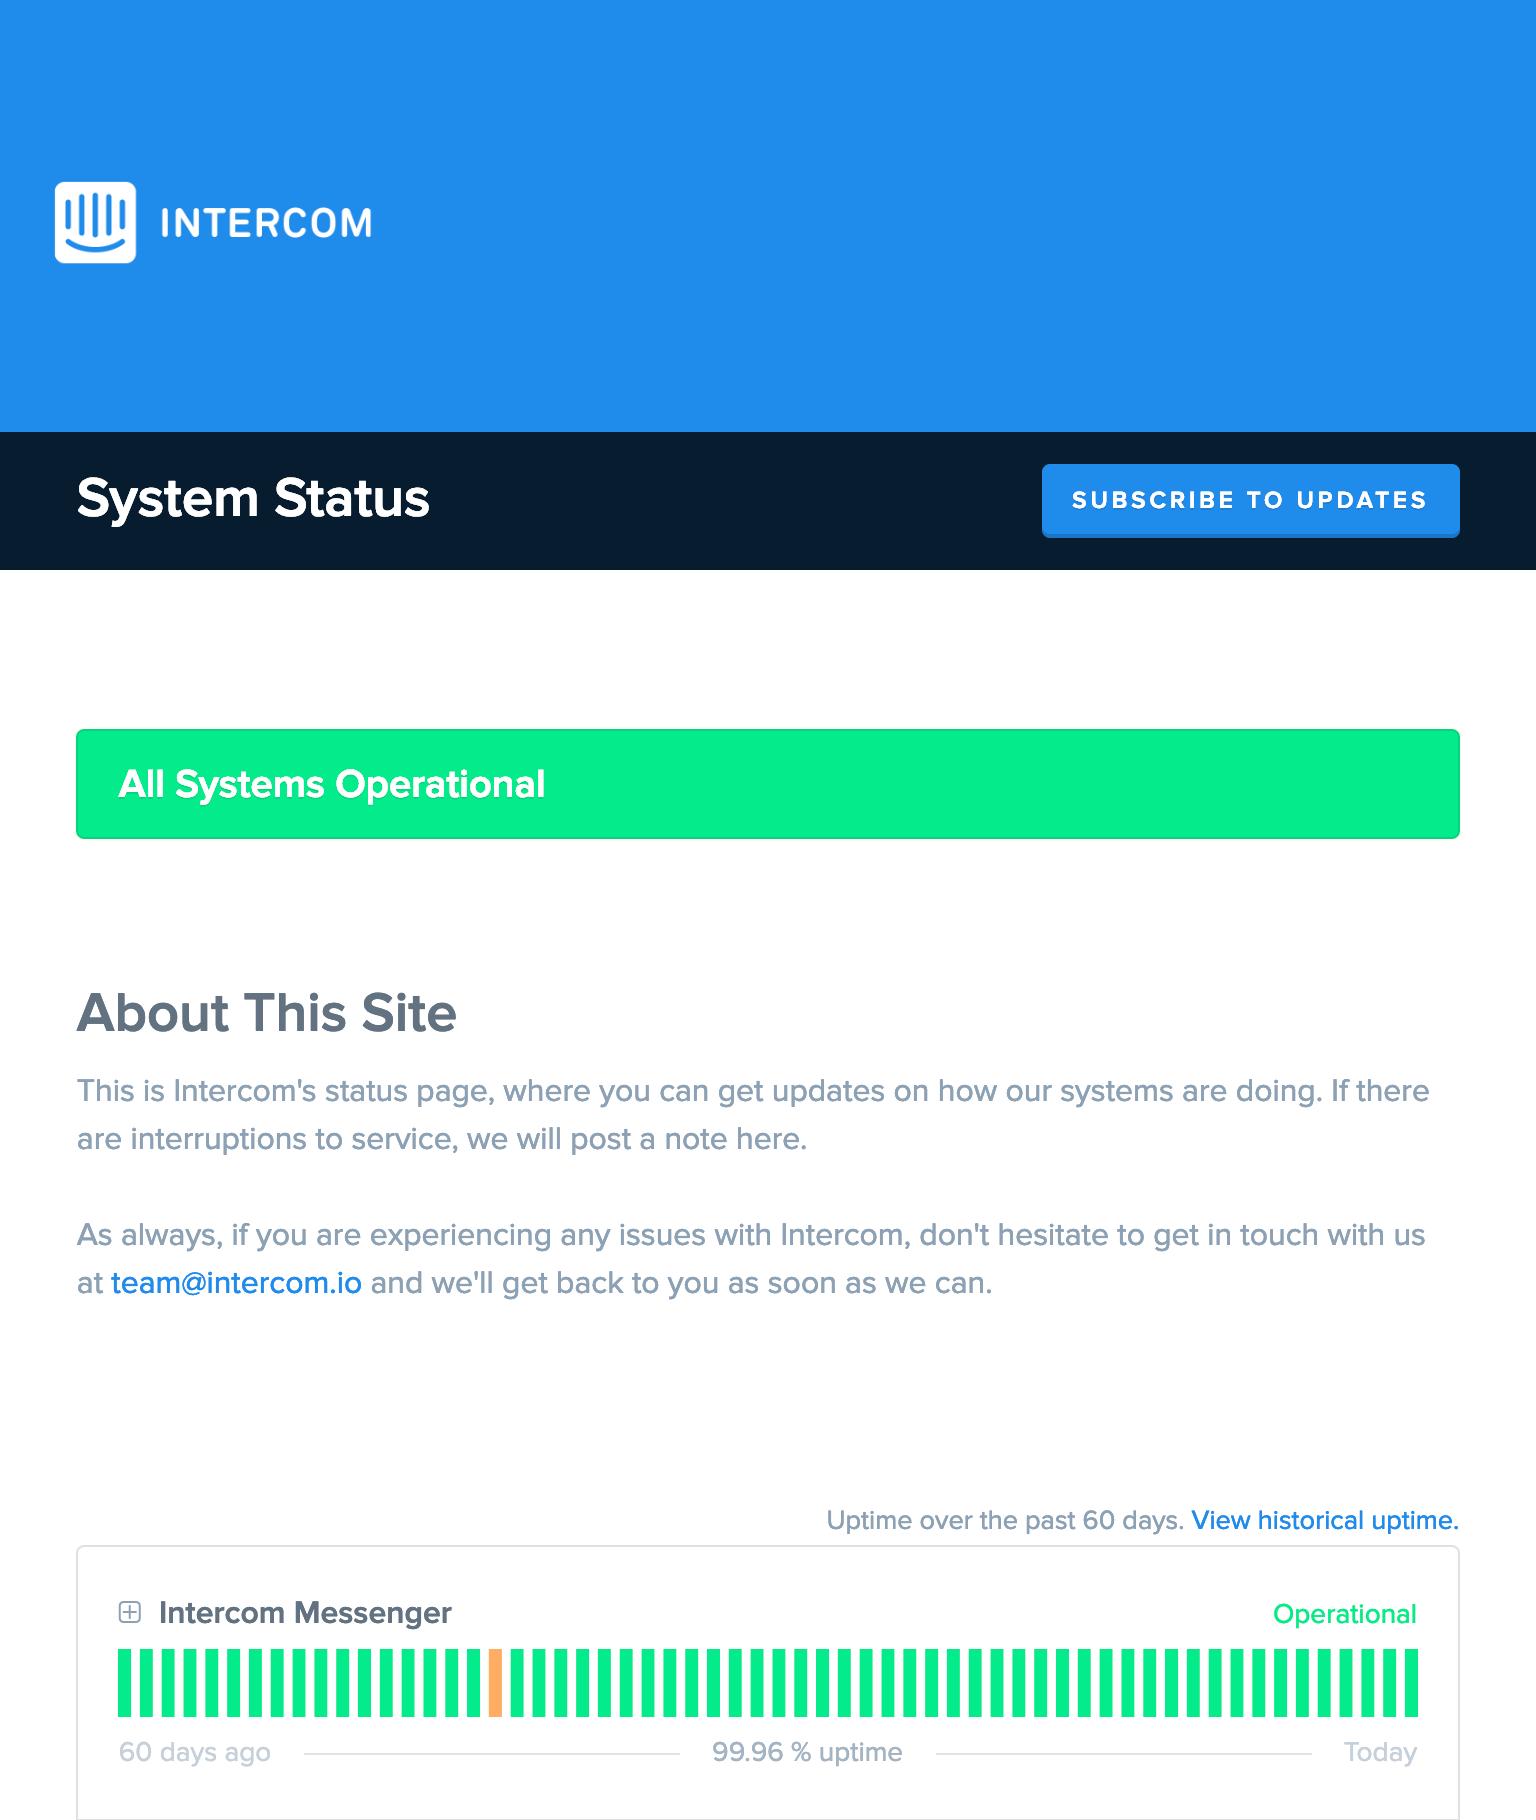 Intercom status checklist